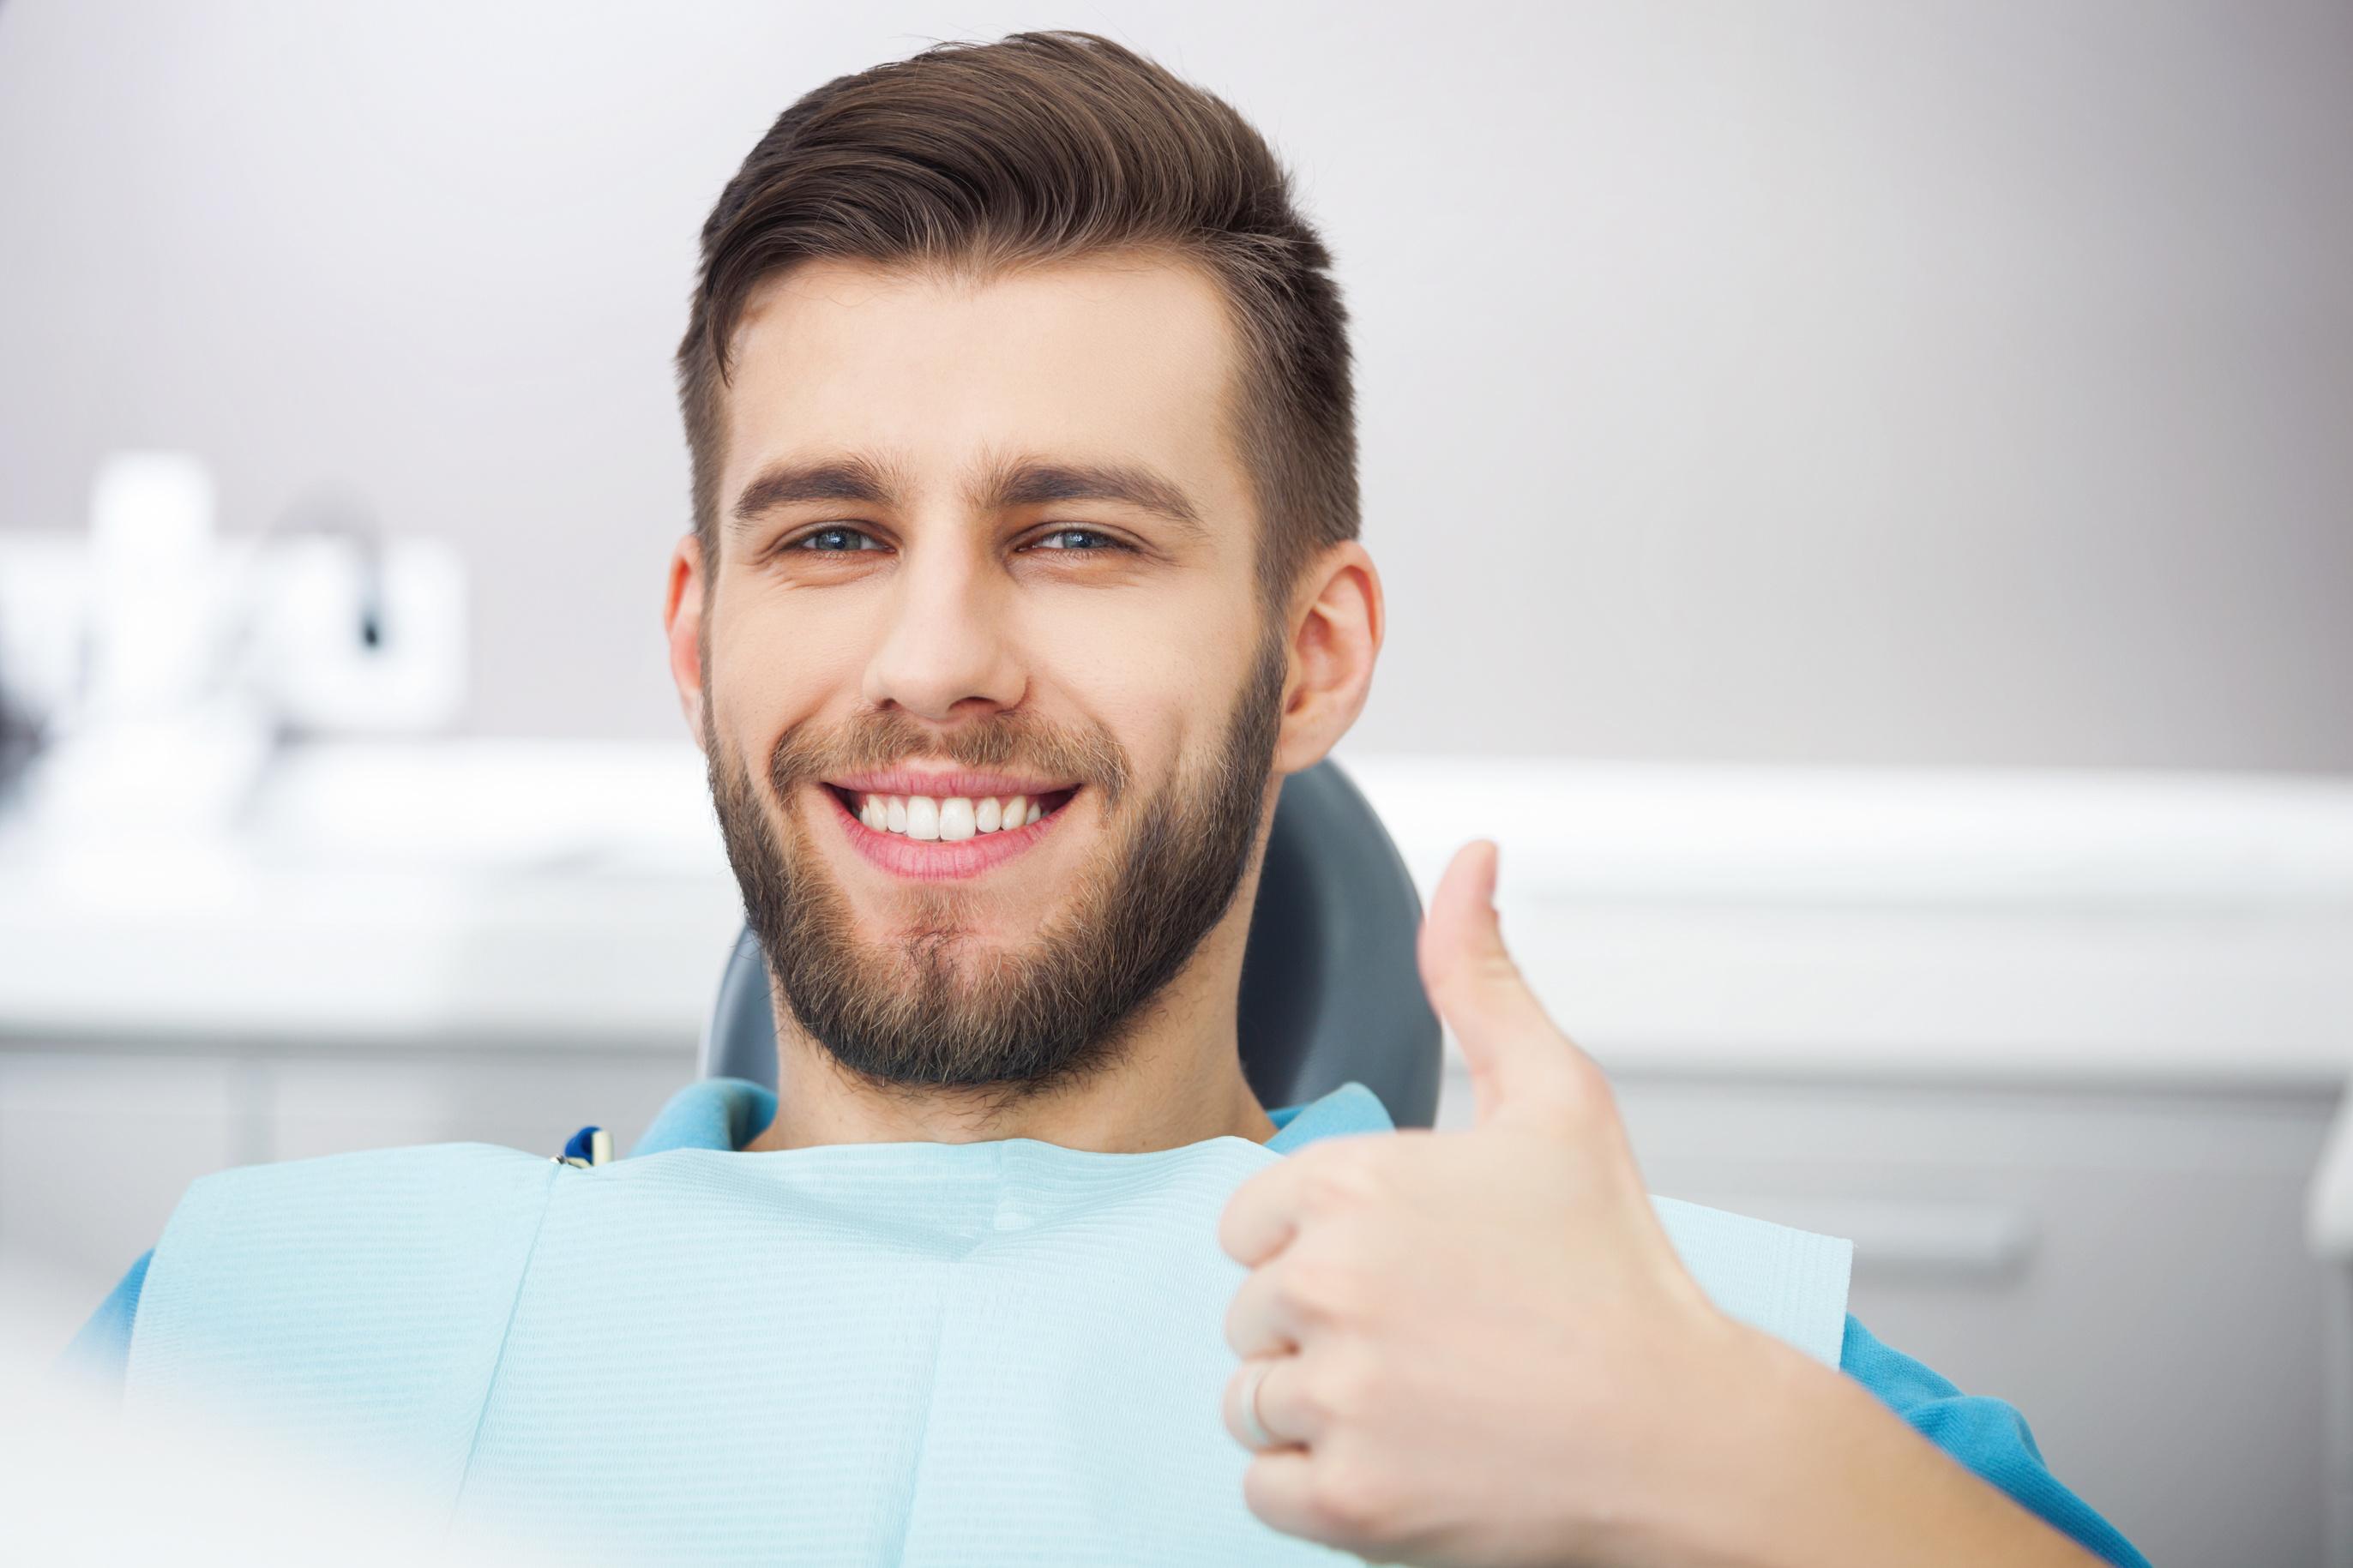 Where can I find a North Brunswick dentist?